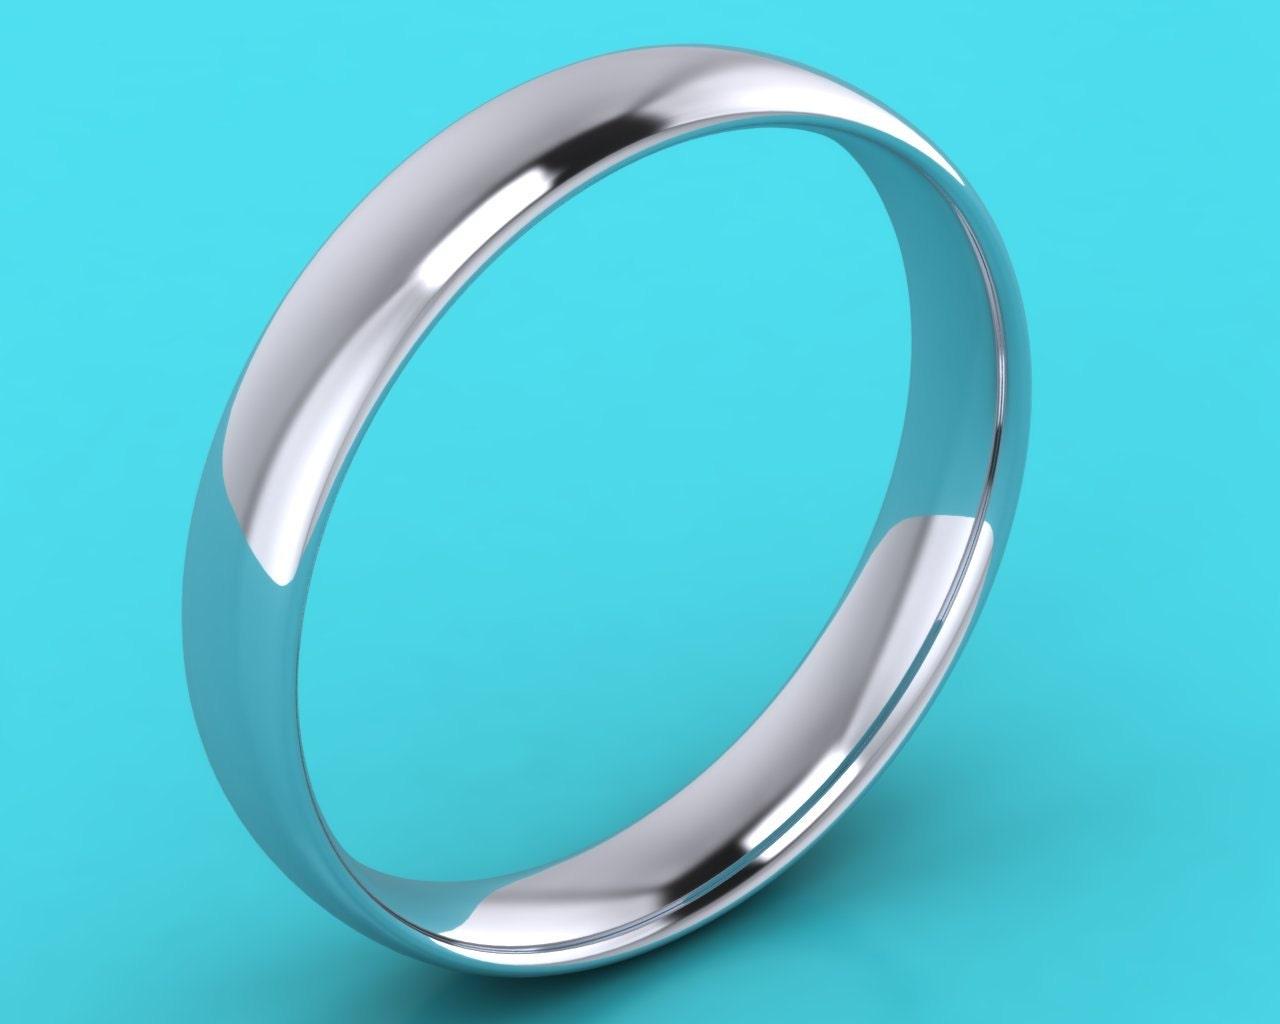 PLATINUM 4mm mens light weight court   4mm Wedding Band wedding  4mm wedding Ring  anniversary   engagement ring hatton garden